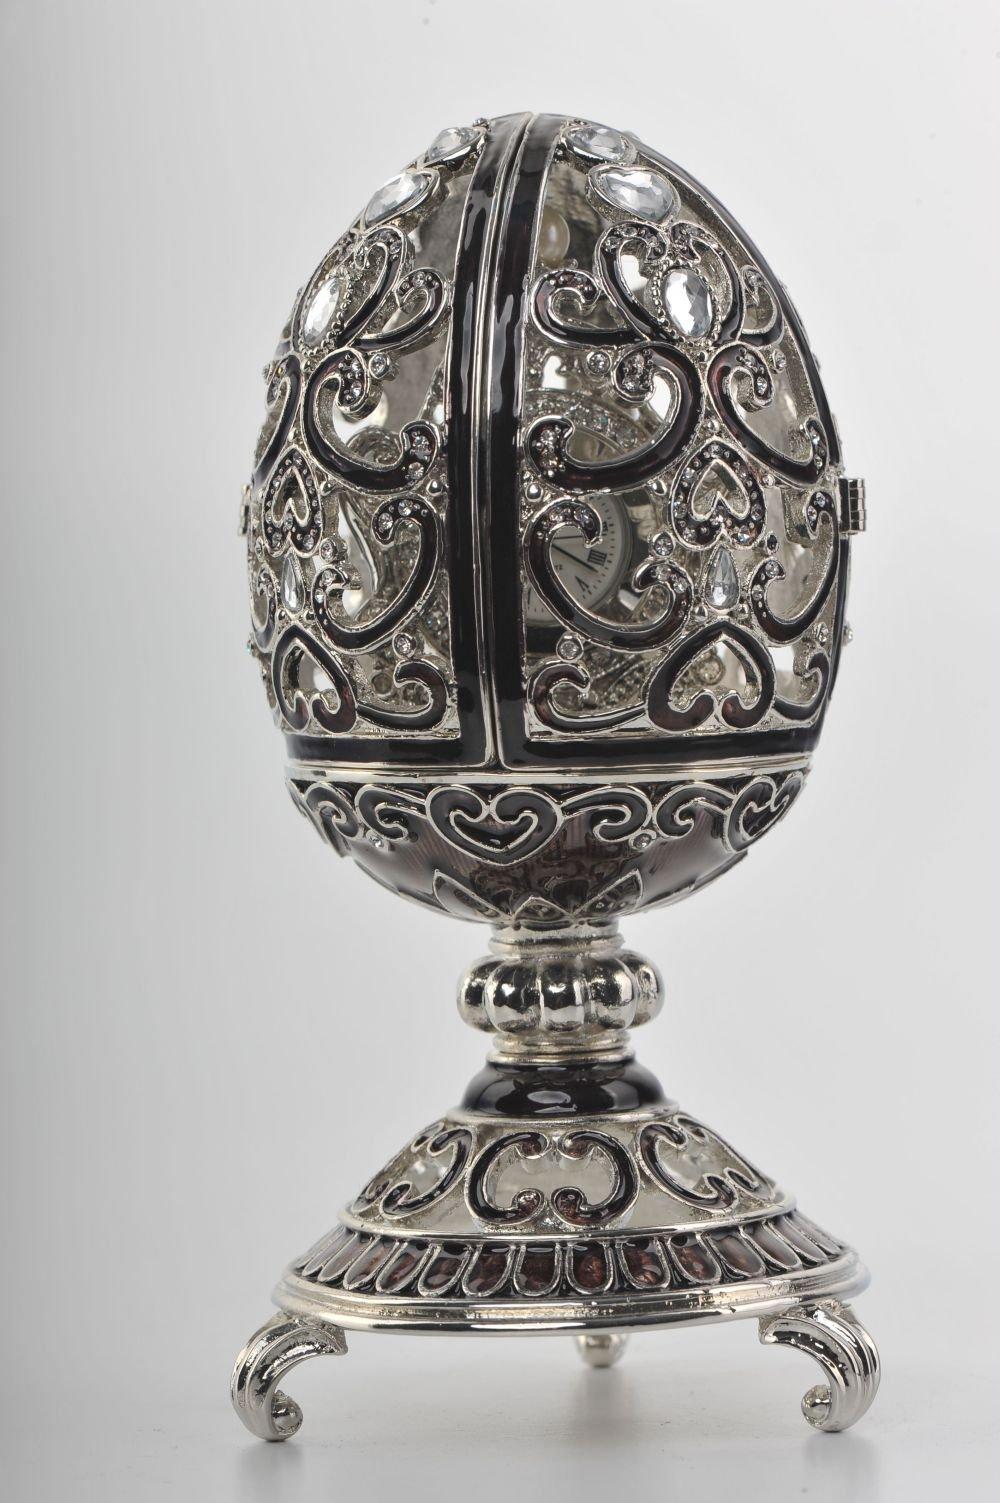 Keren Kopal Silver & Black Faberge Egg Trinket Box with a Pearl and a Clock Inside